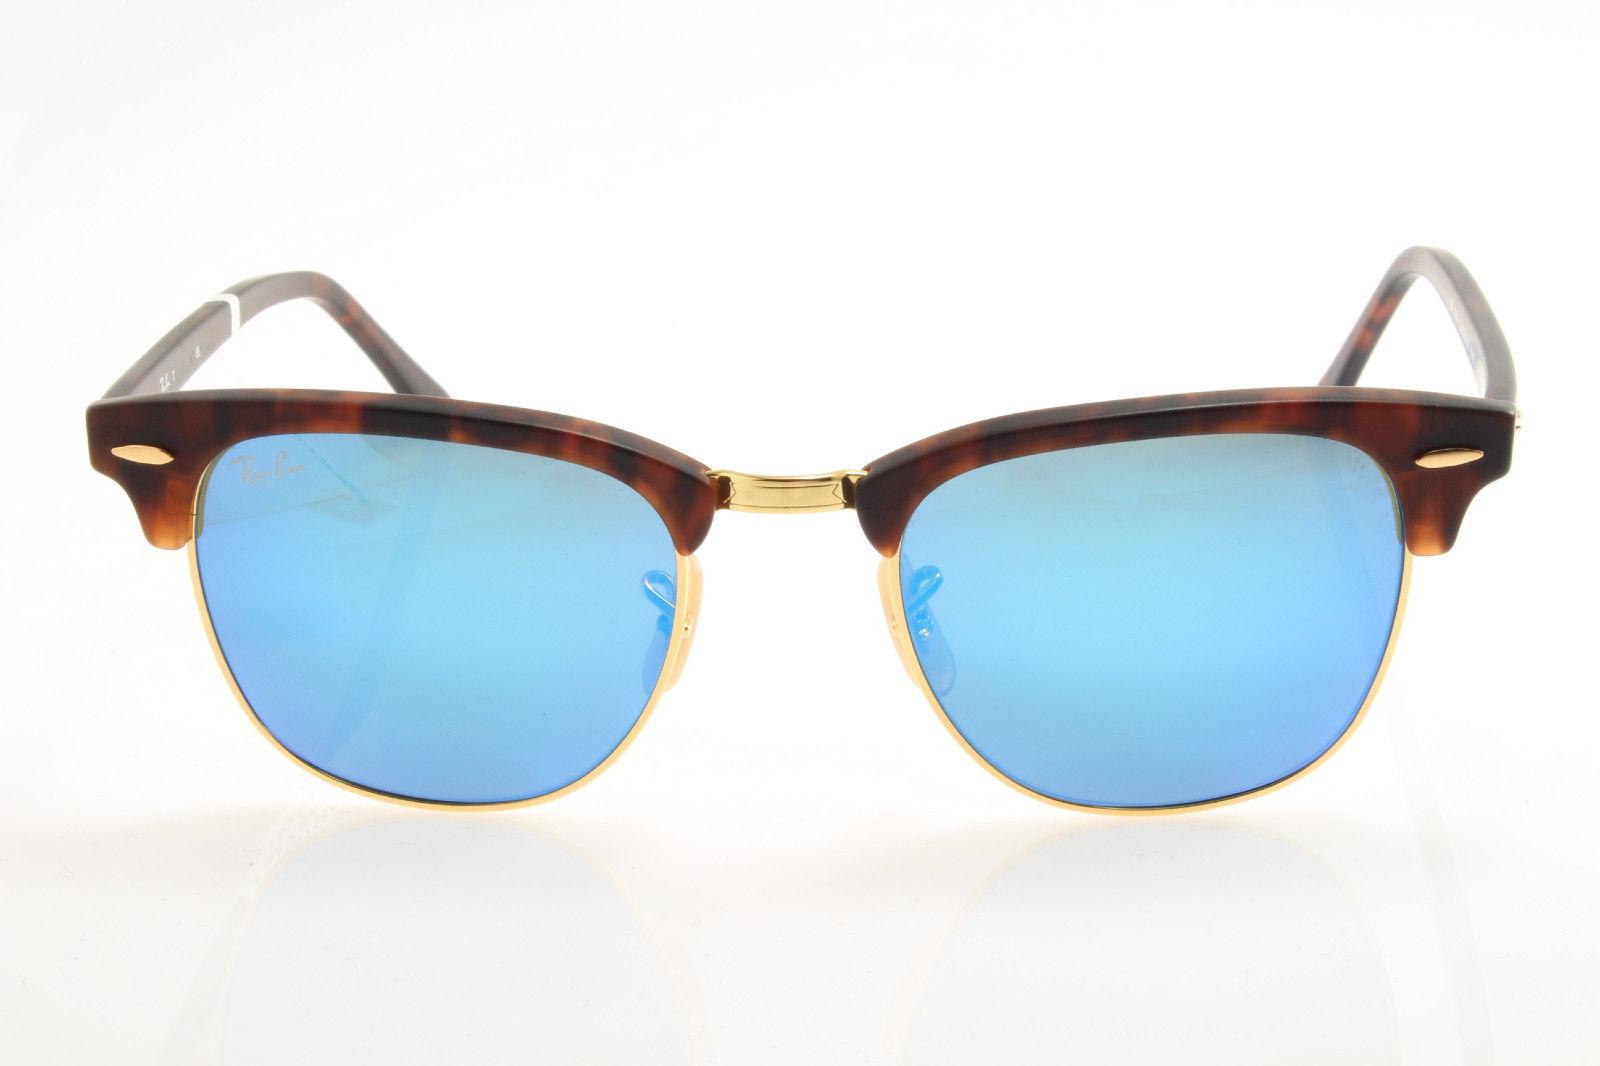 72493d2bf5f New original sunglasses Ray Ban RB 3016 Clubmaster 1145 17 49 Havana Blue  Mirror